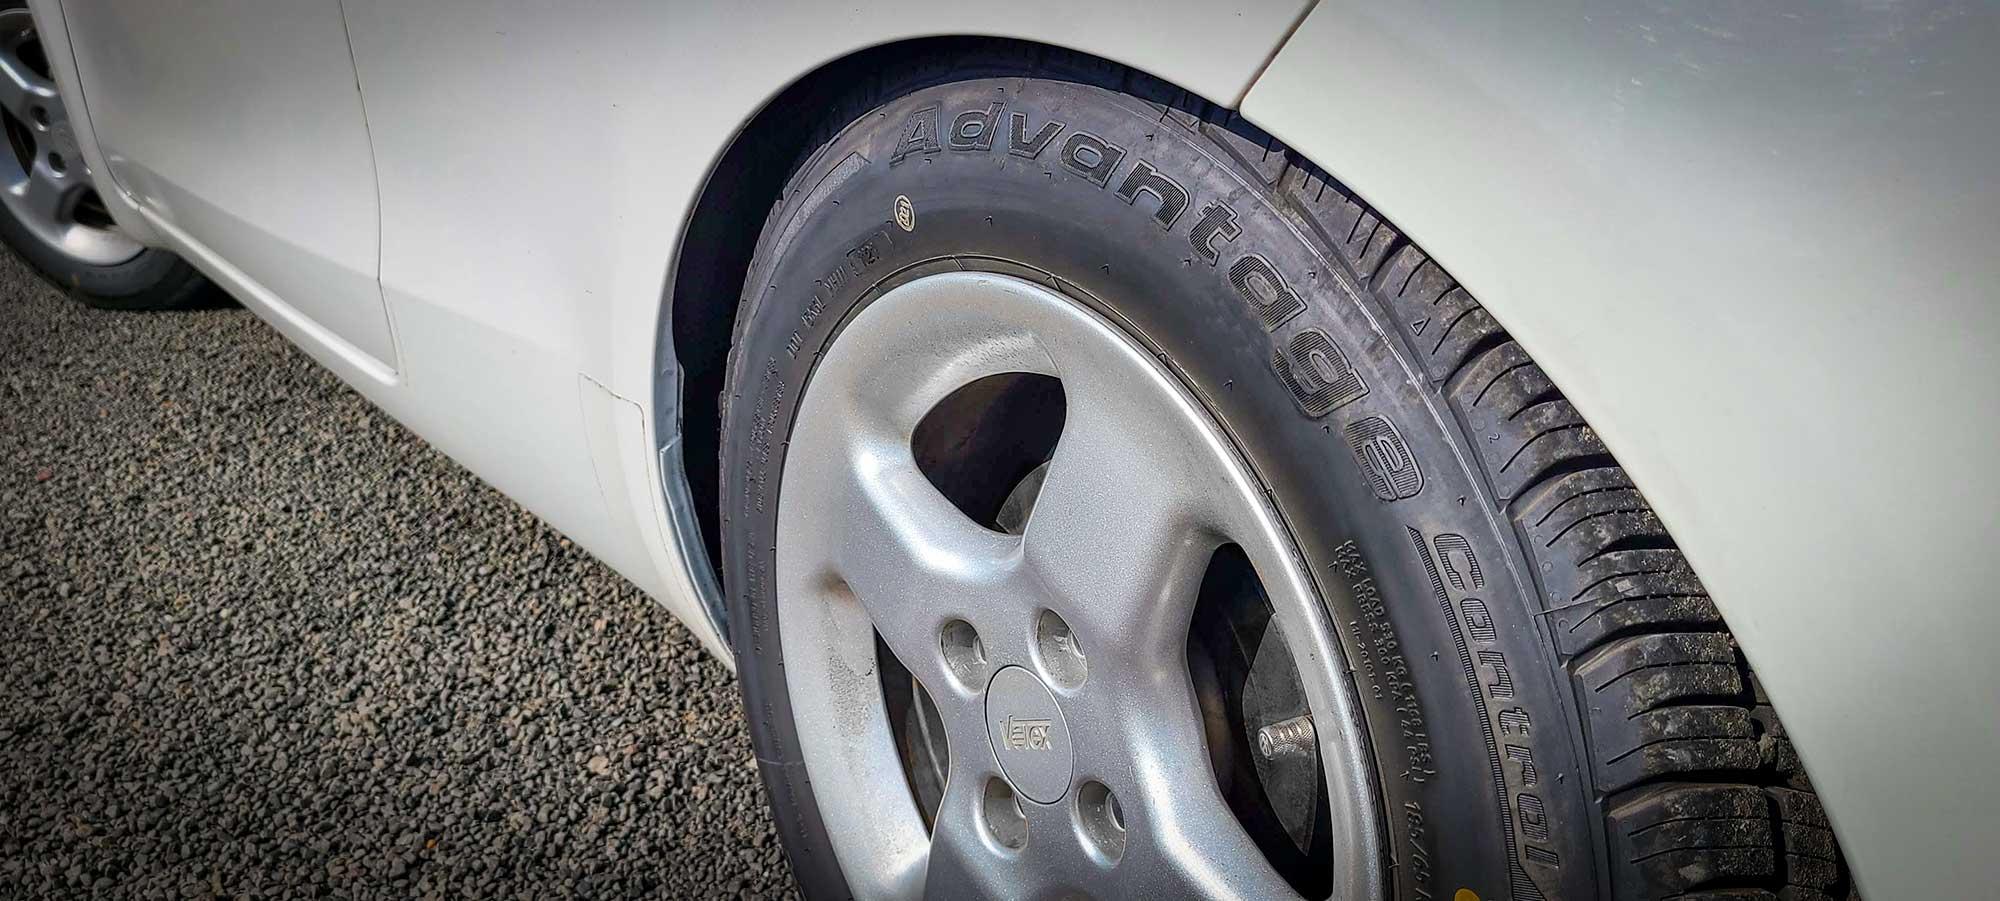 All-Season All-Stars: BFGoodrich Advantage Control Tires